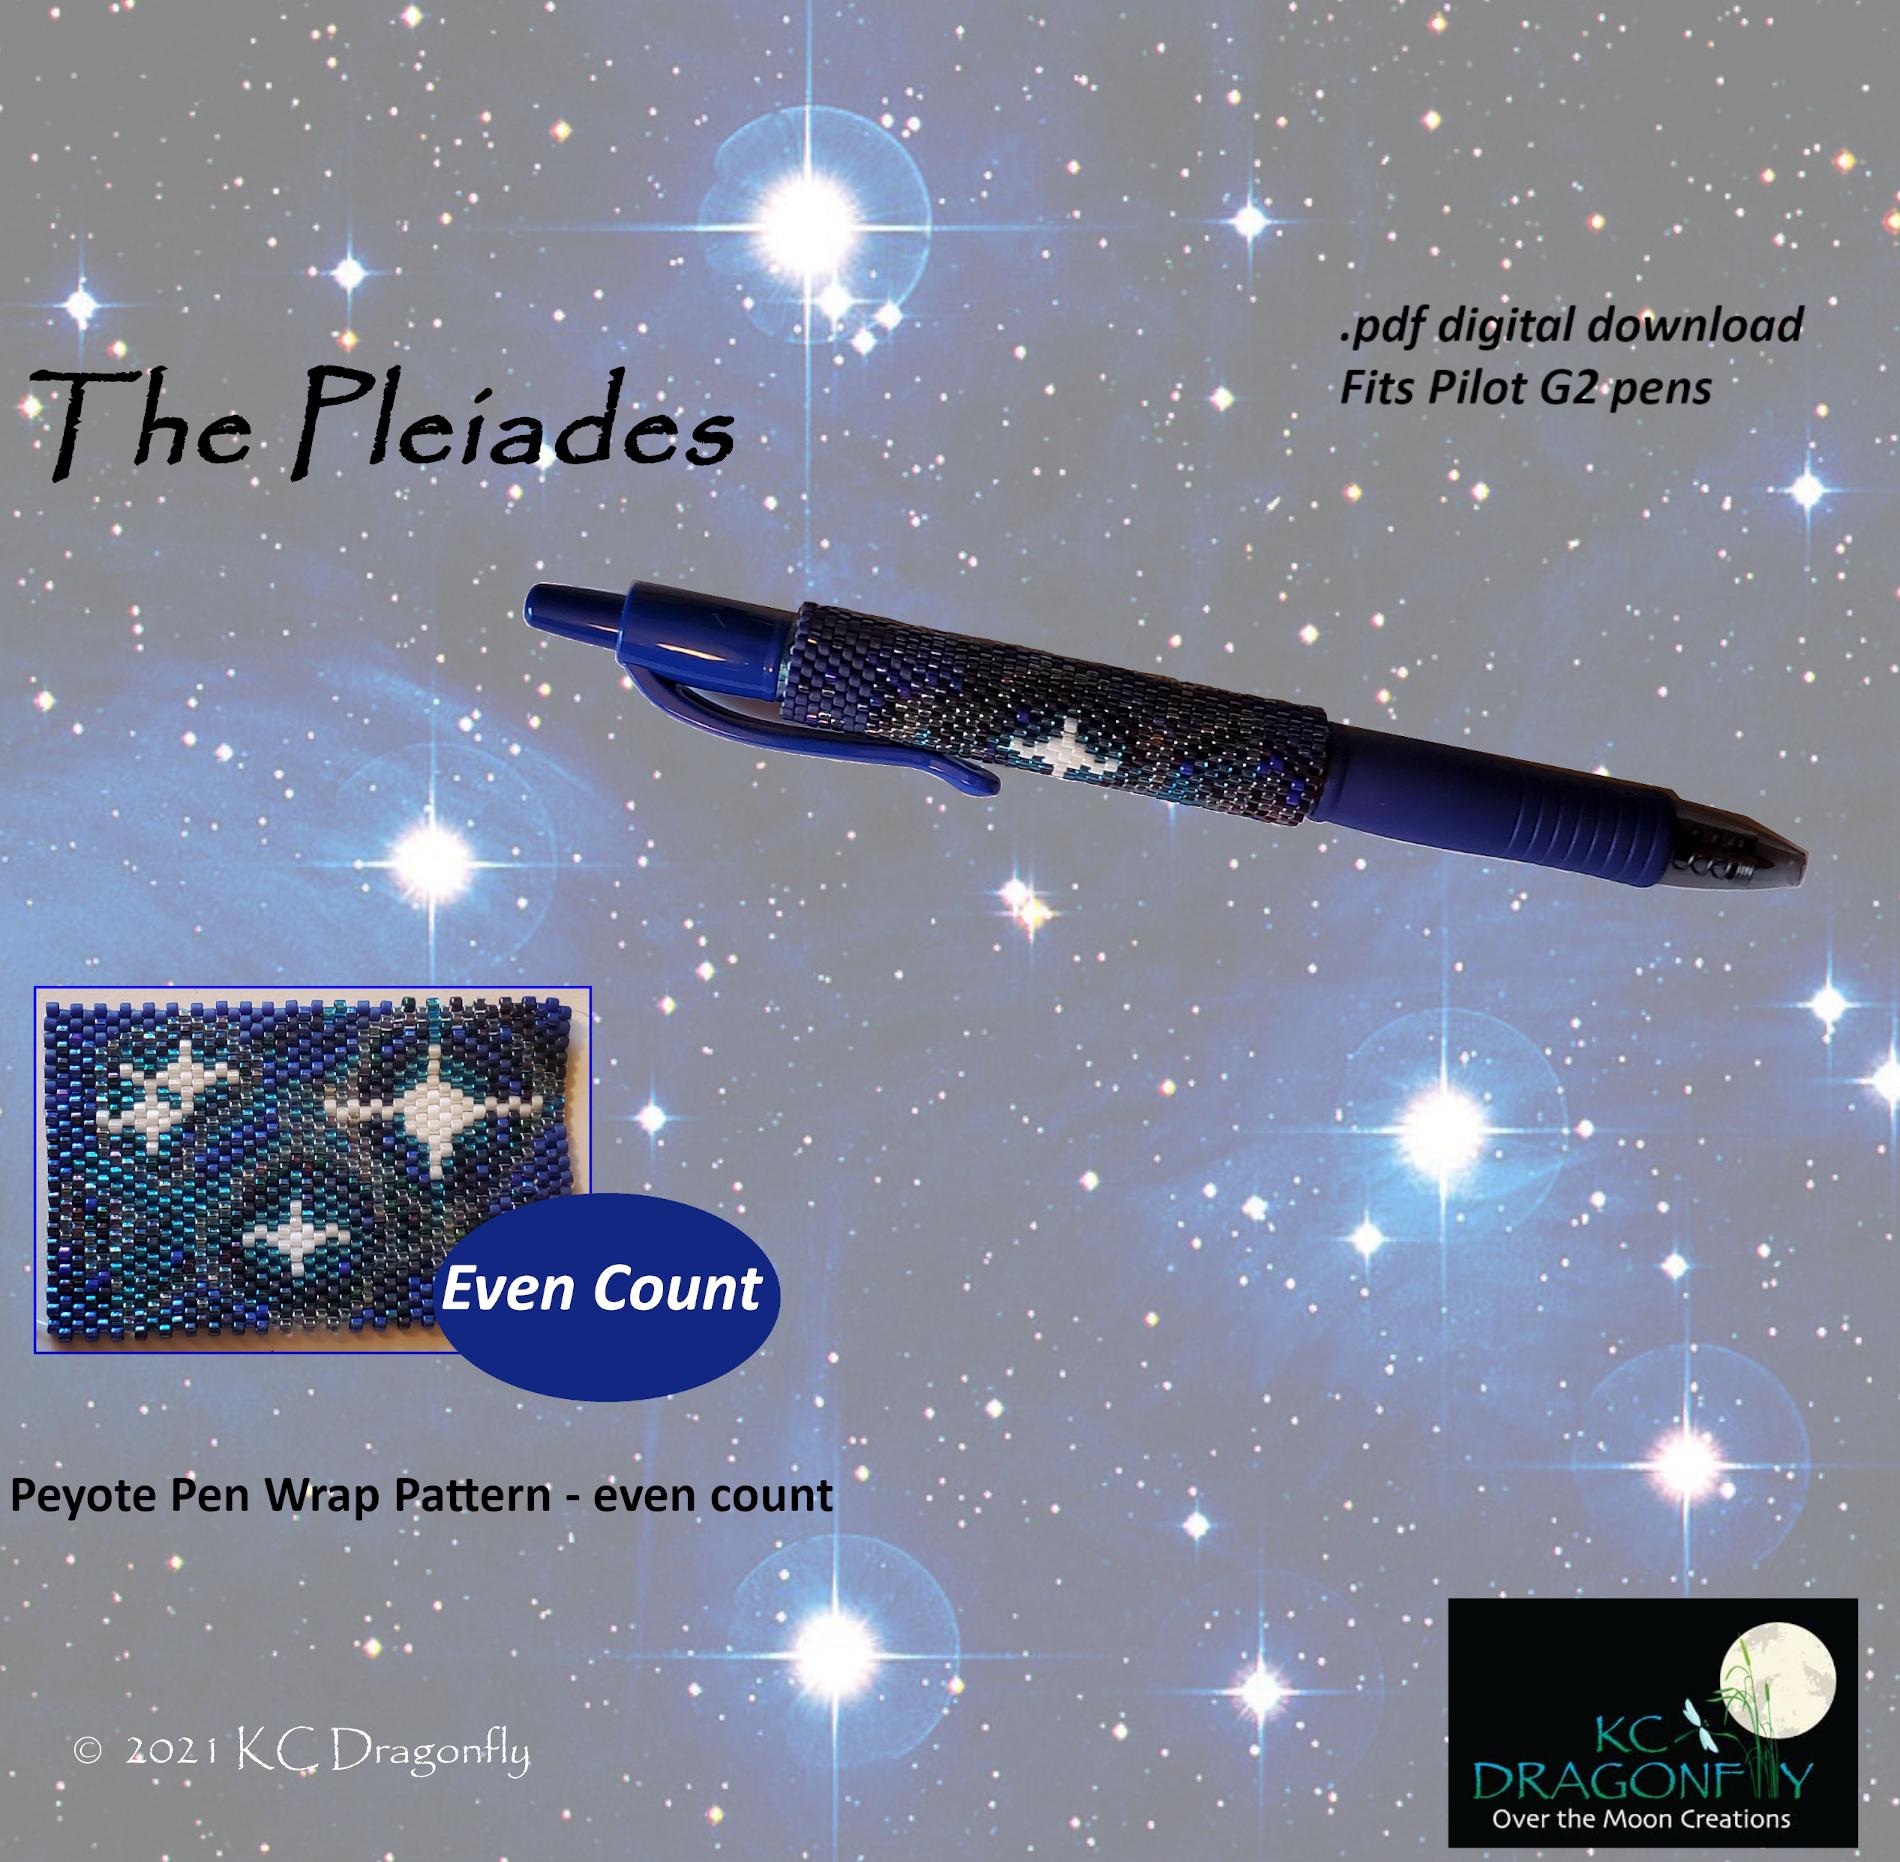 KC Dragonfly - Etsy Listing - Pen Wrap - The Pleiades